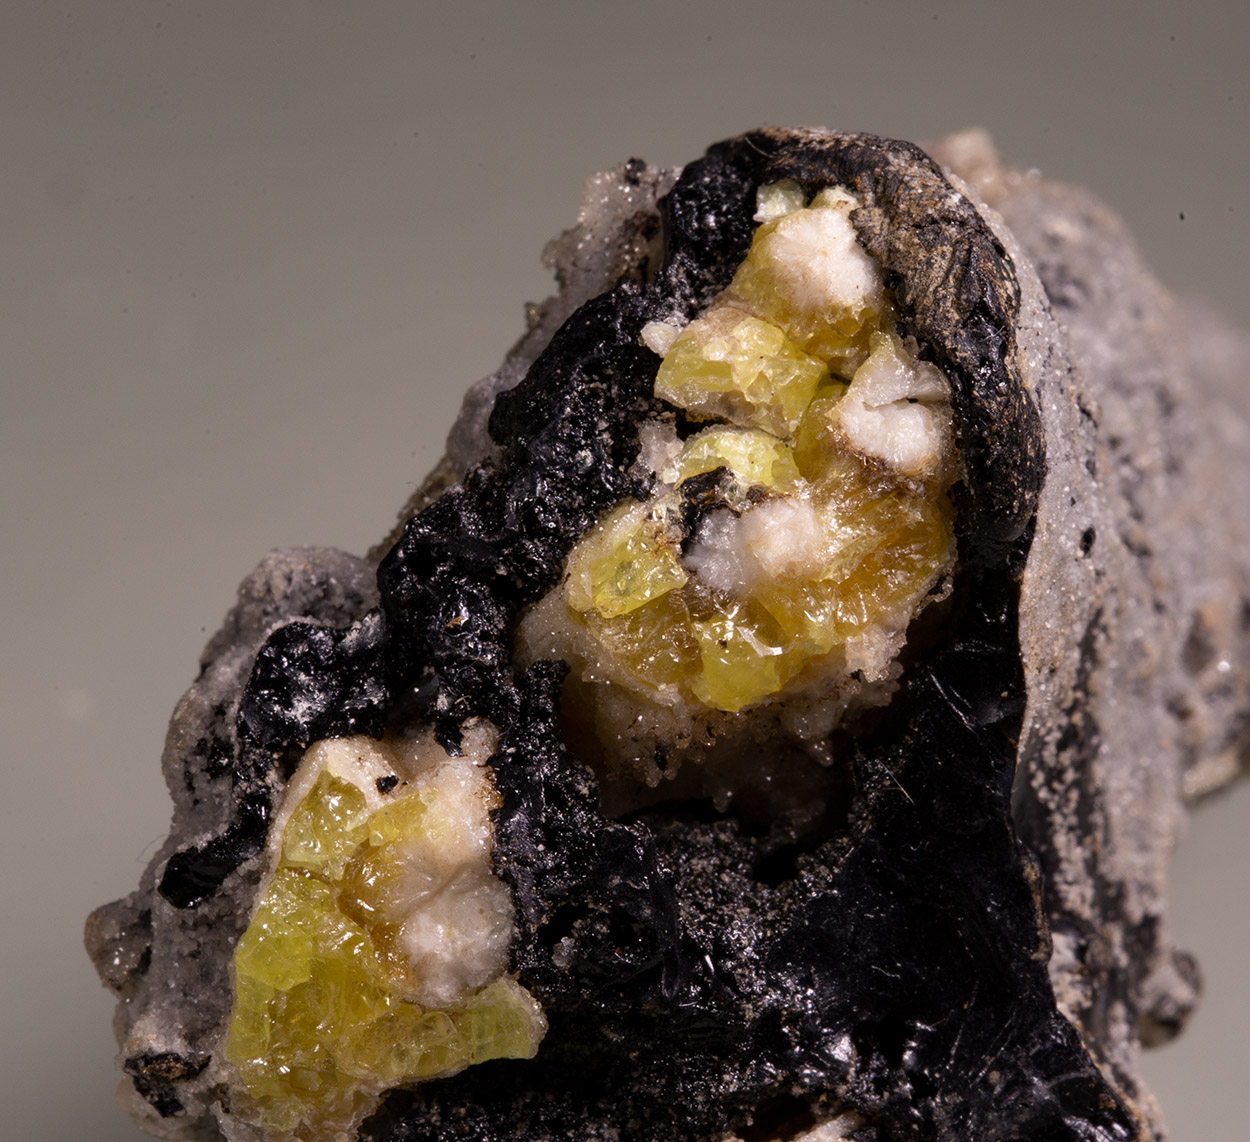 Sulphur & Asphaltum